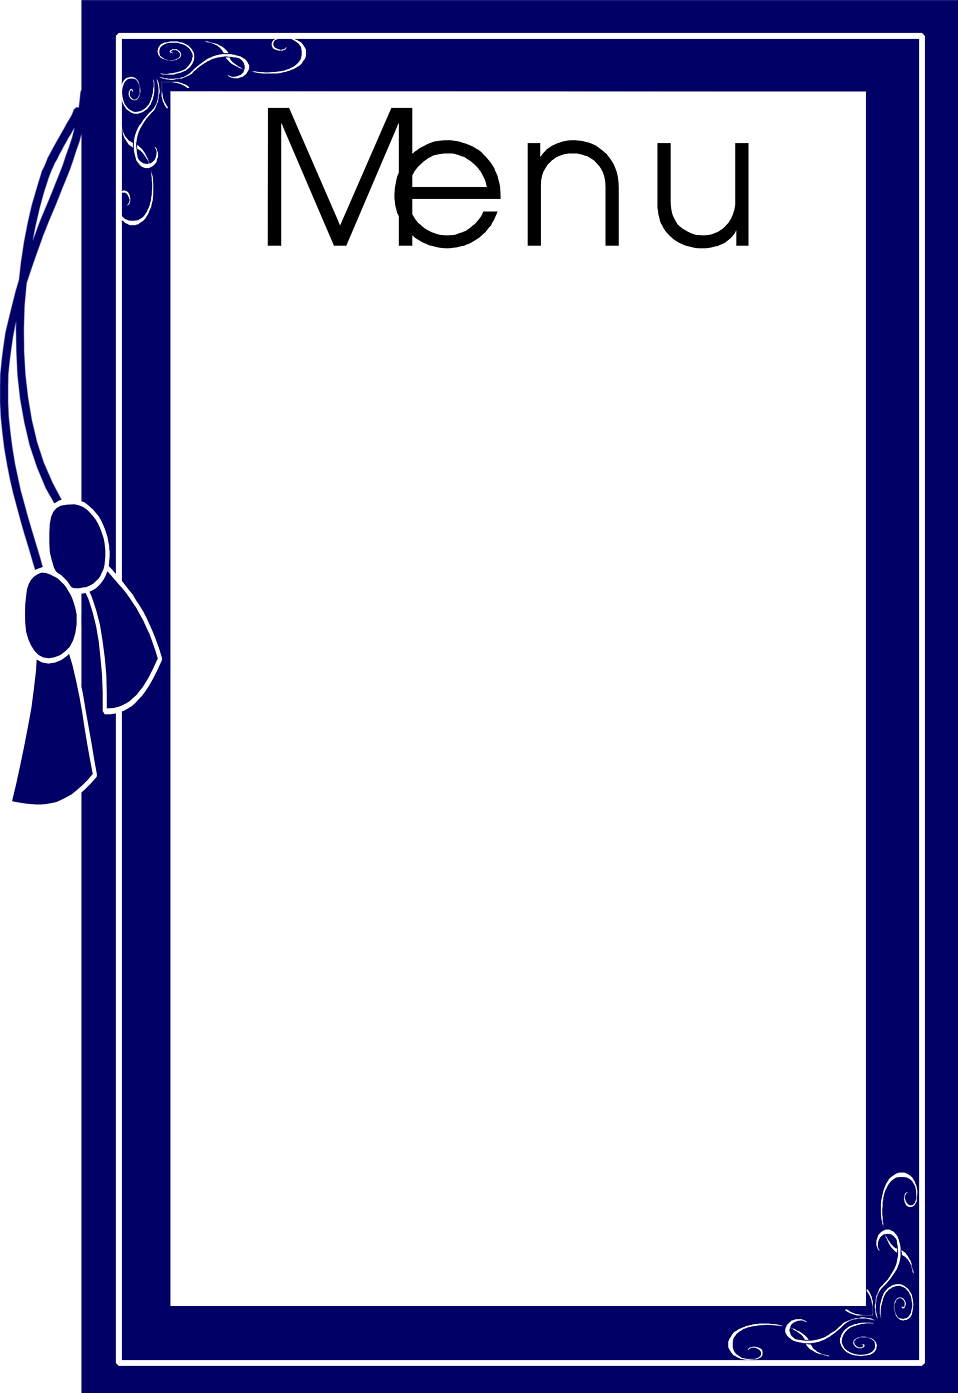 Restaurant menu design clipart image transparent Menu Cliparts | Free download best Menu Cliparts on ... image transparent